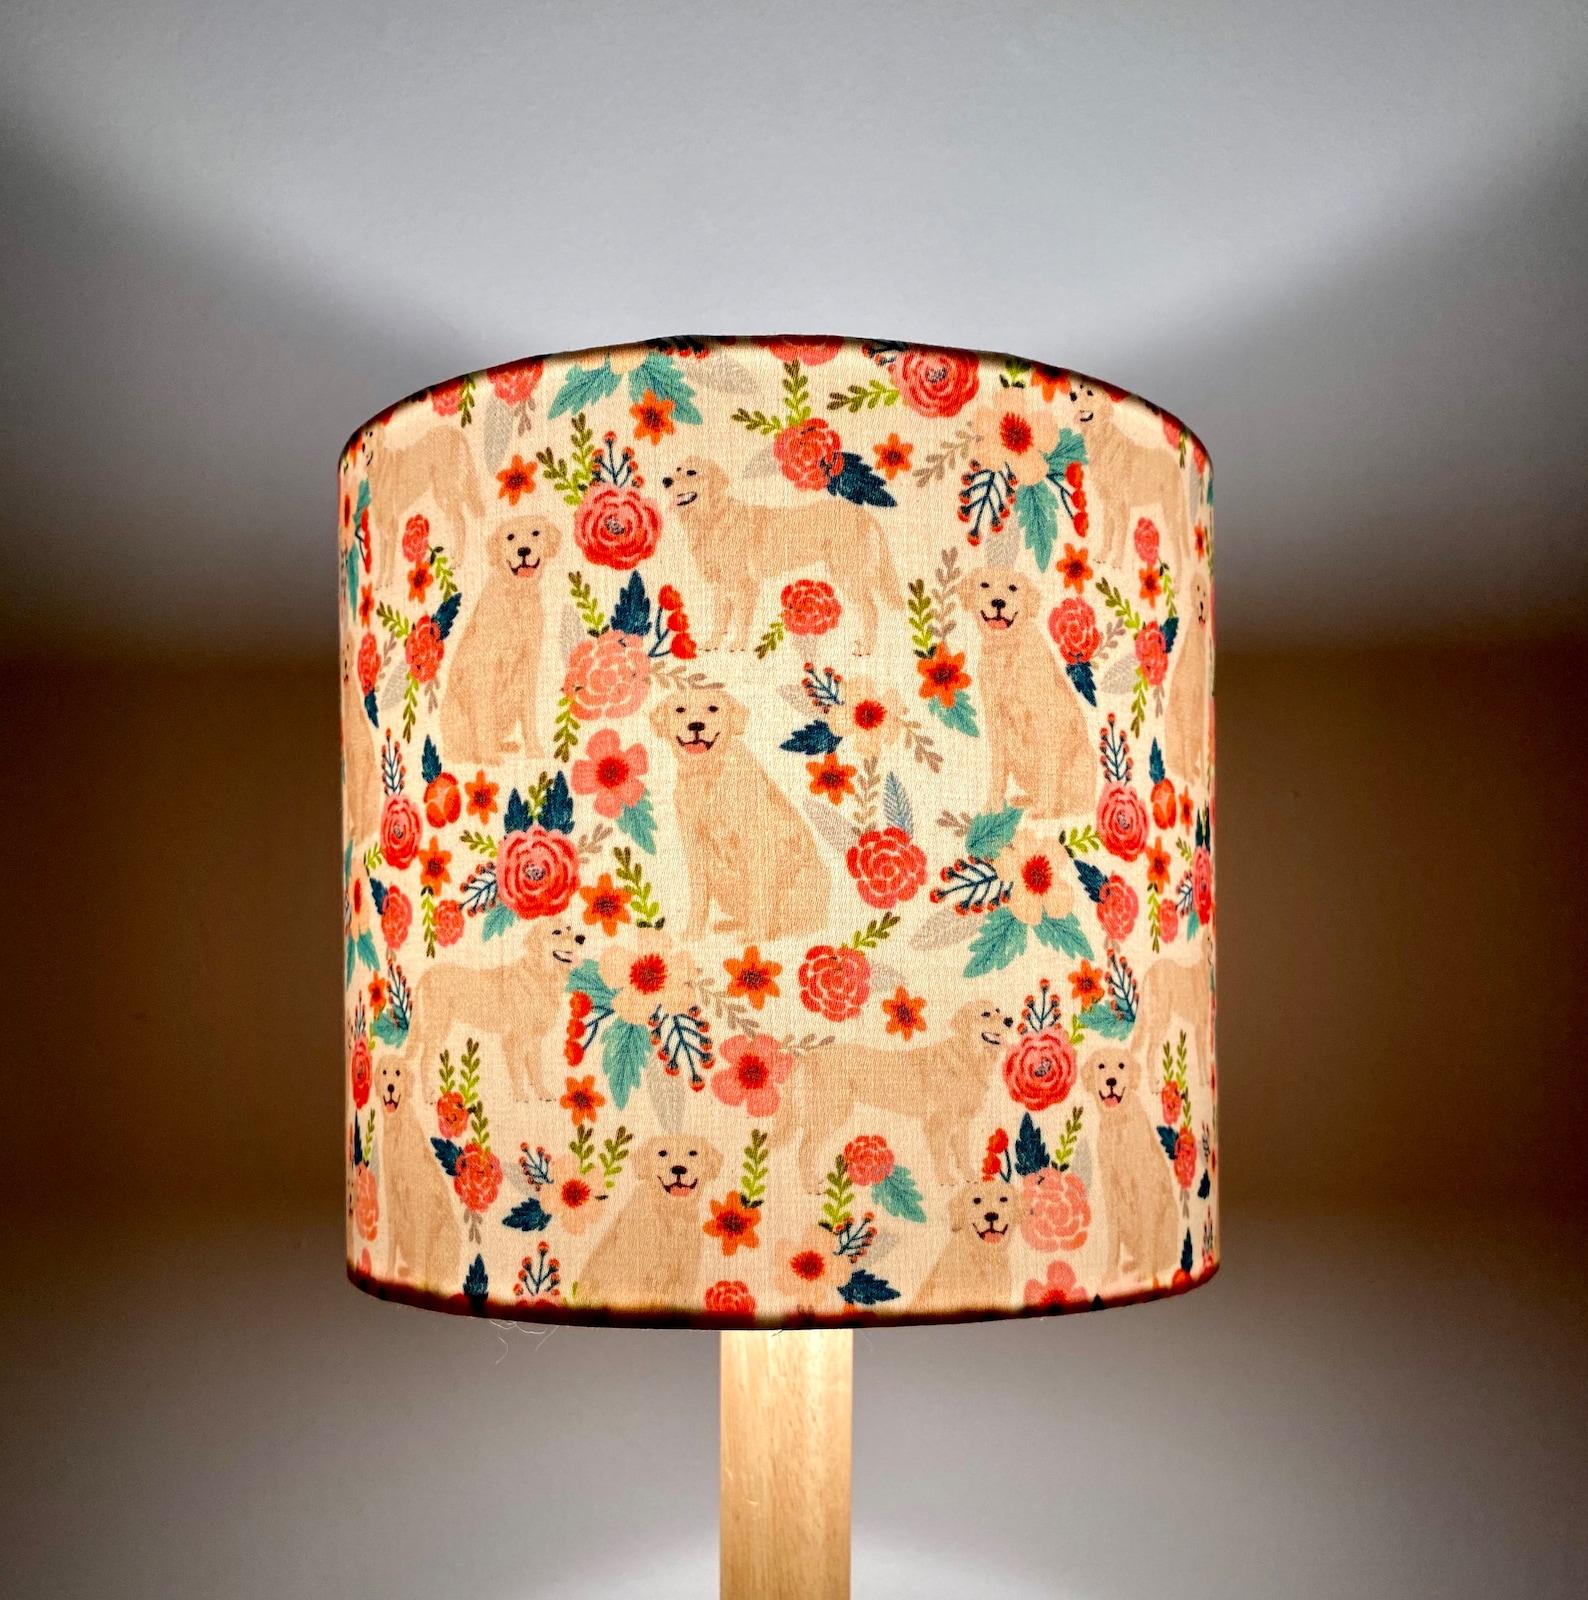 Golden Retriever Lampshade